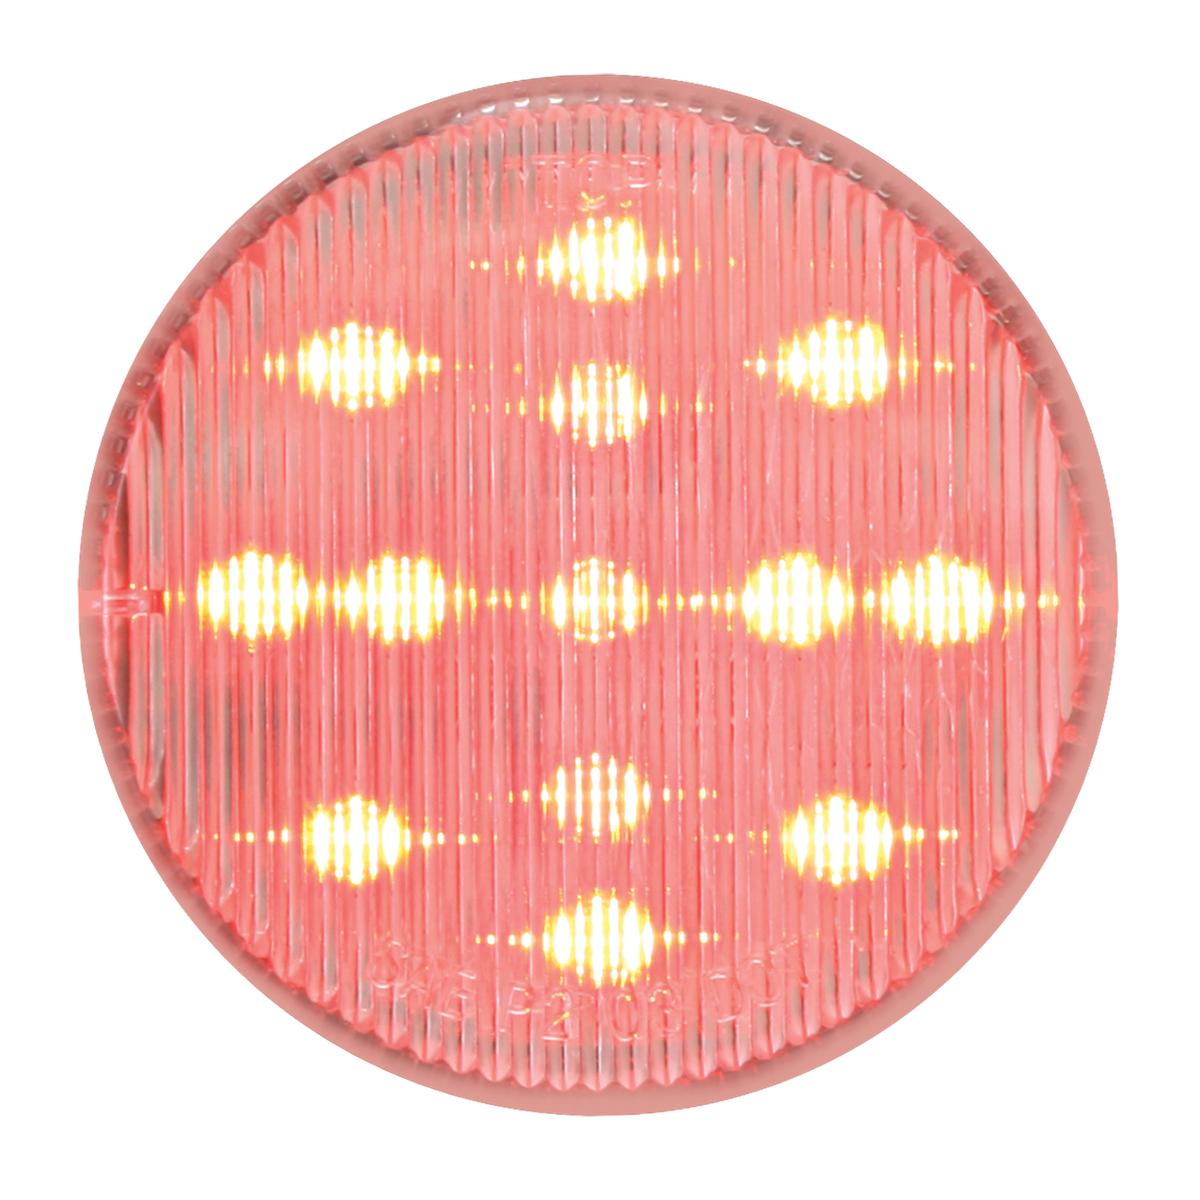 "79318 2-1/2"" Round Fleet Marker Light"